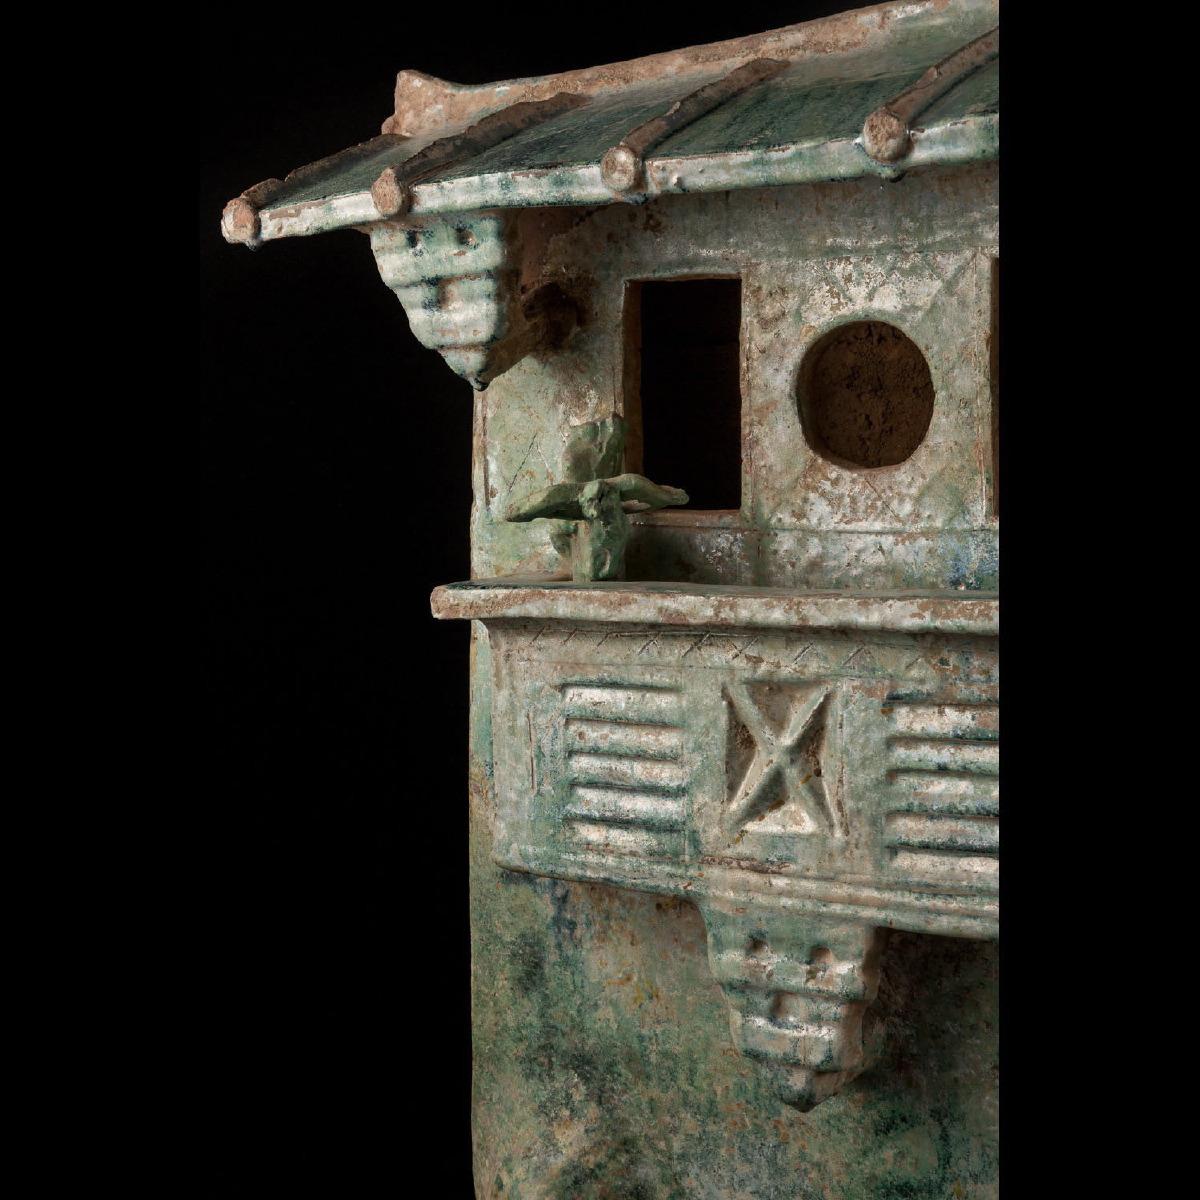 Photo of MODEL OF A GRAIN STOREHOUSE EASTERN HAN